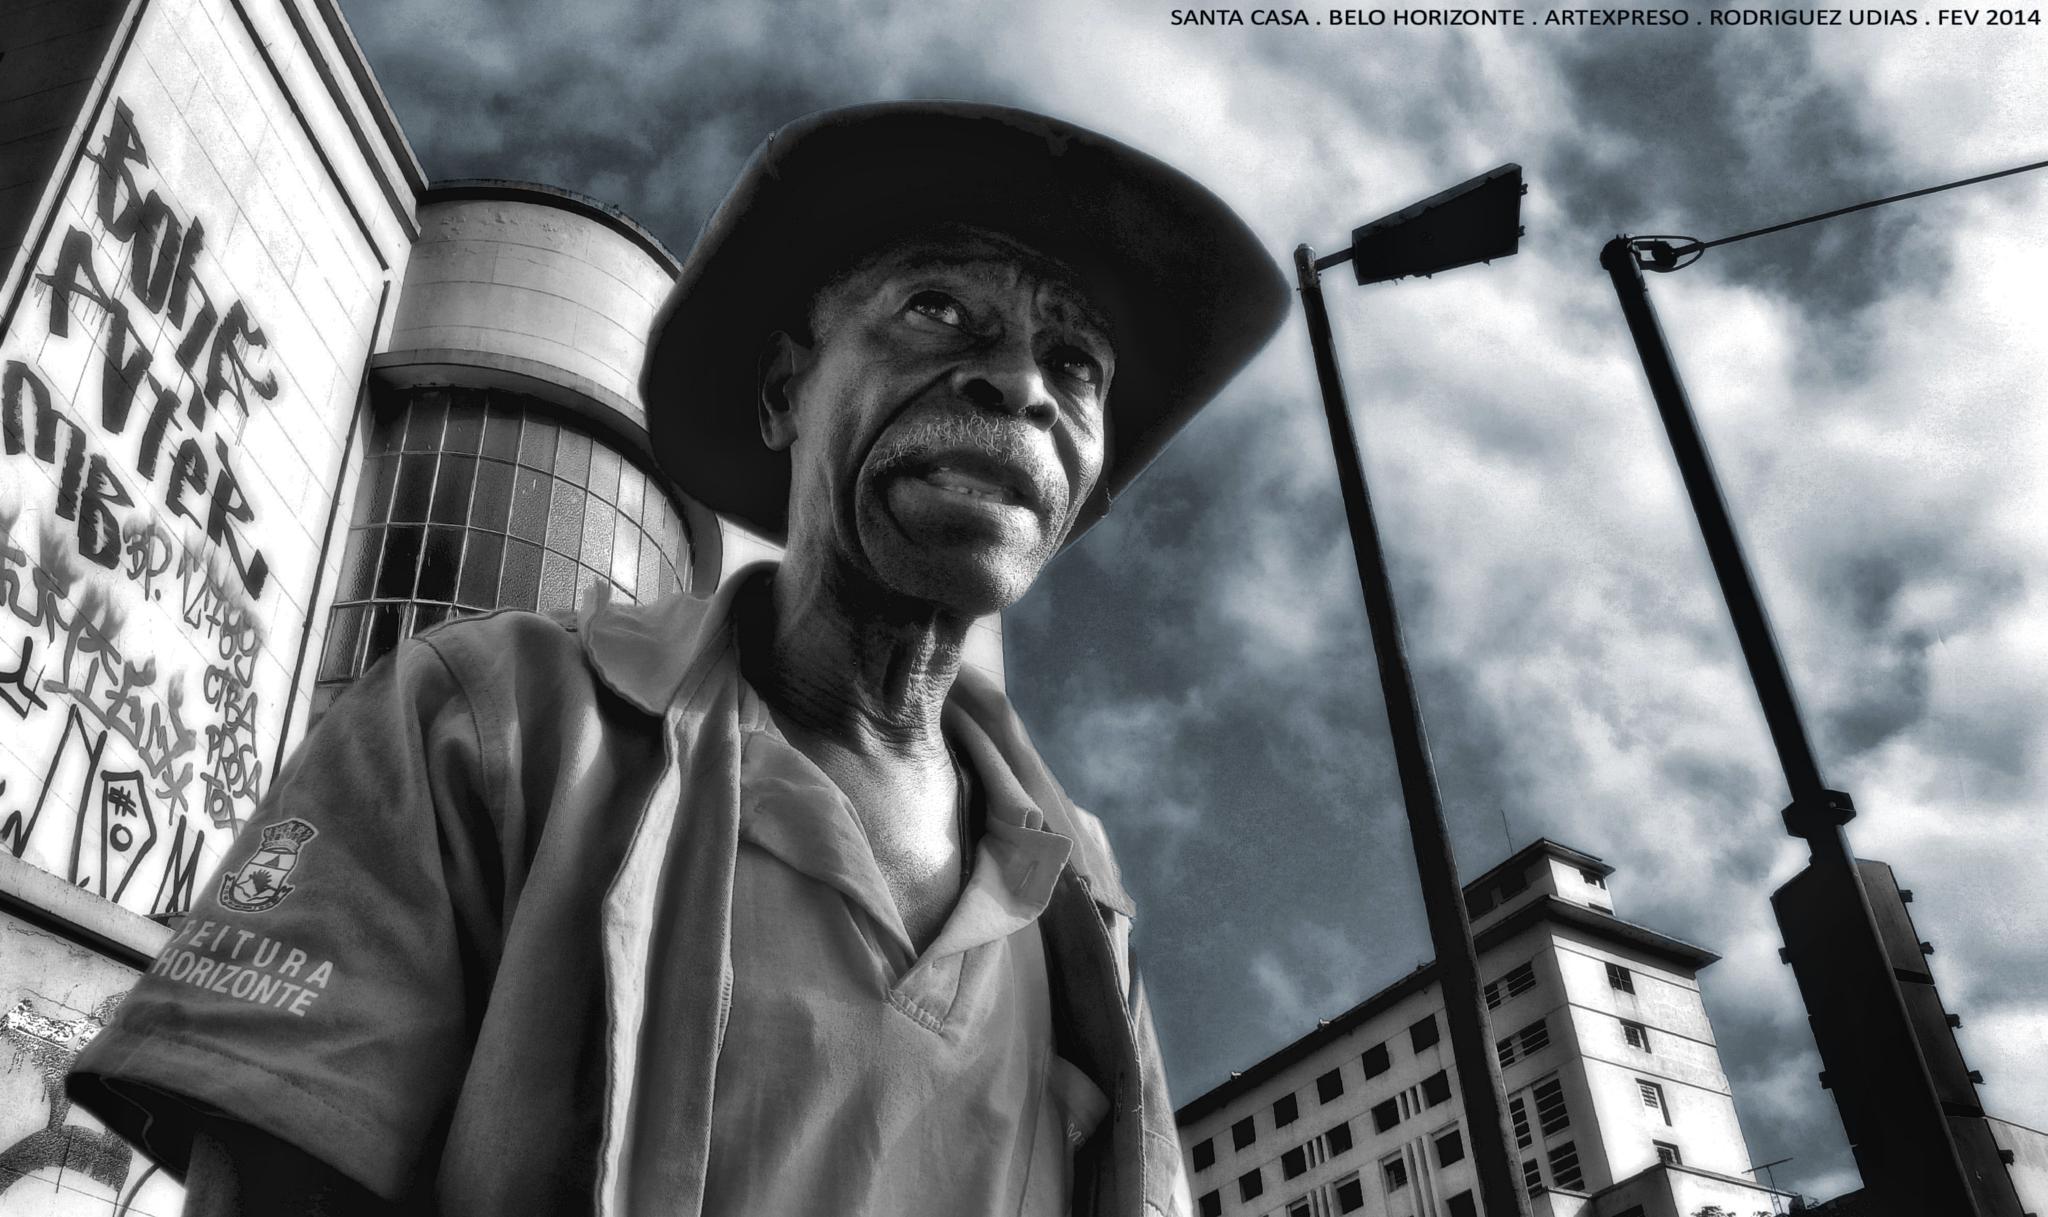 Street Photography 29 . Belo Horizonte / Artexpreso 2014 .. by  Artexpreso